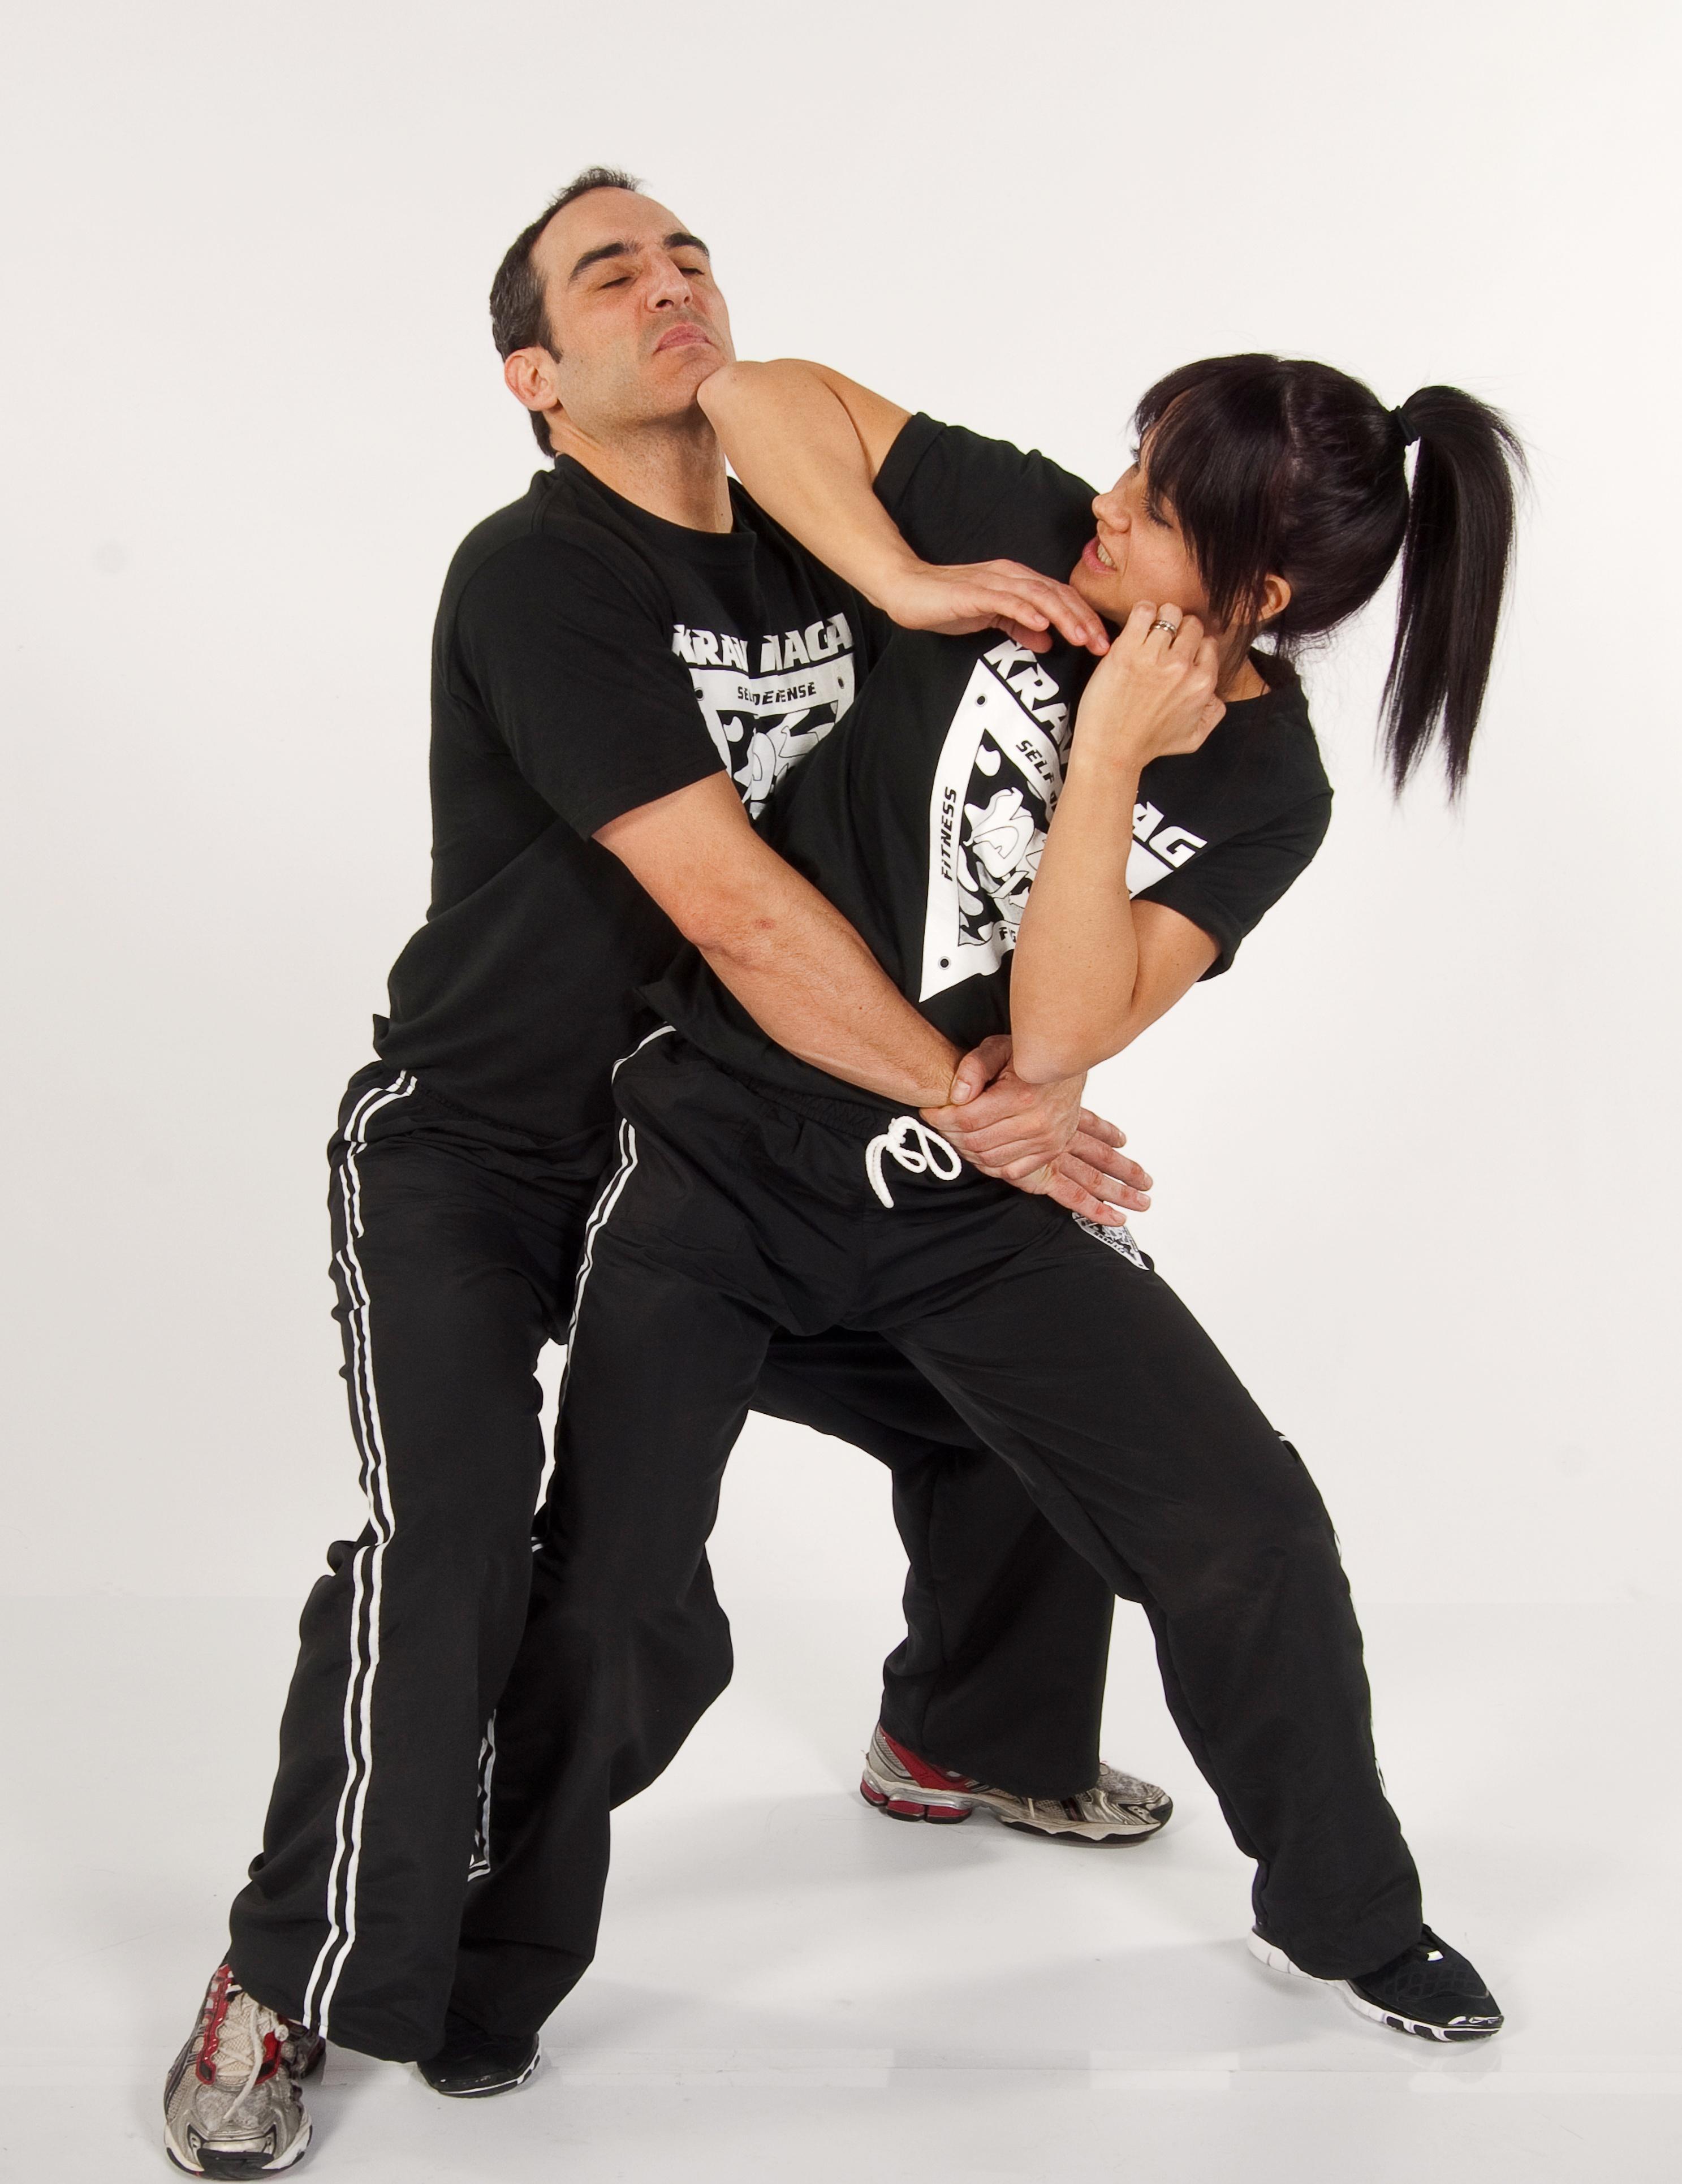 Krav maga is a great art for self-defense. Take that!